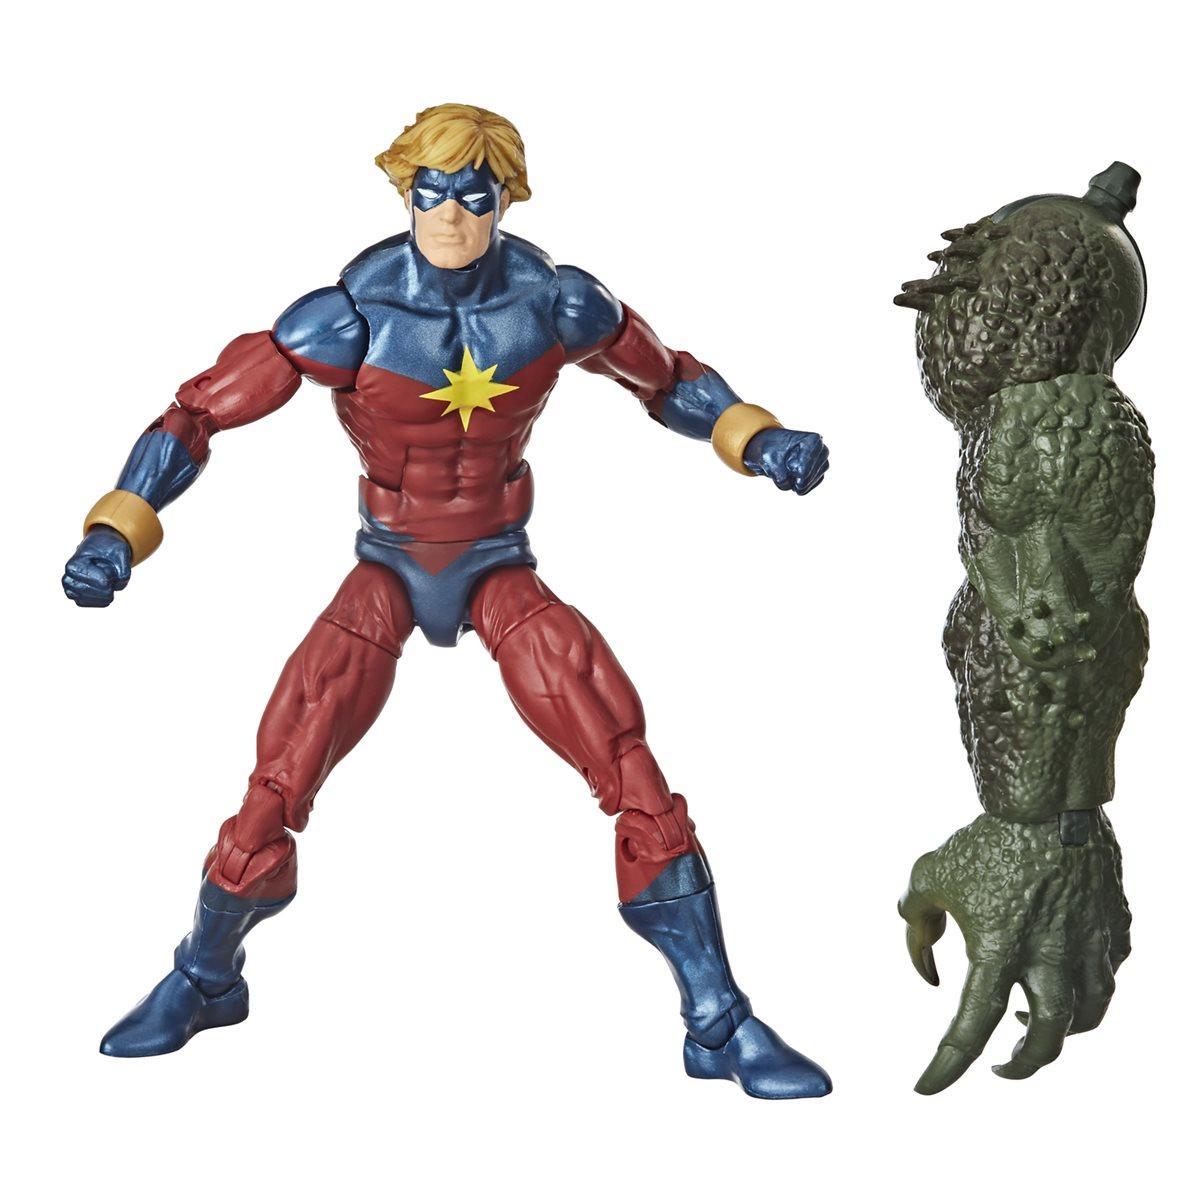 Marvel Legends Star Lord Entertainment Earth Broken Action Figure